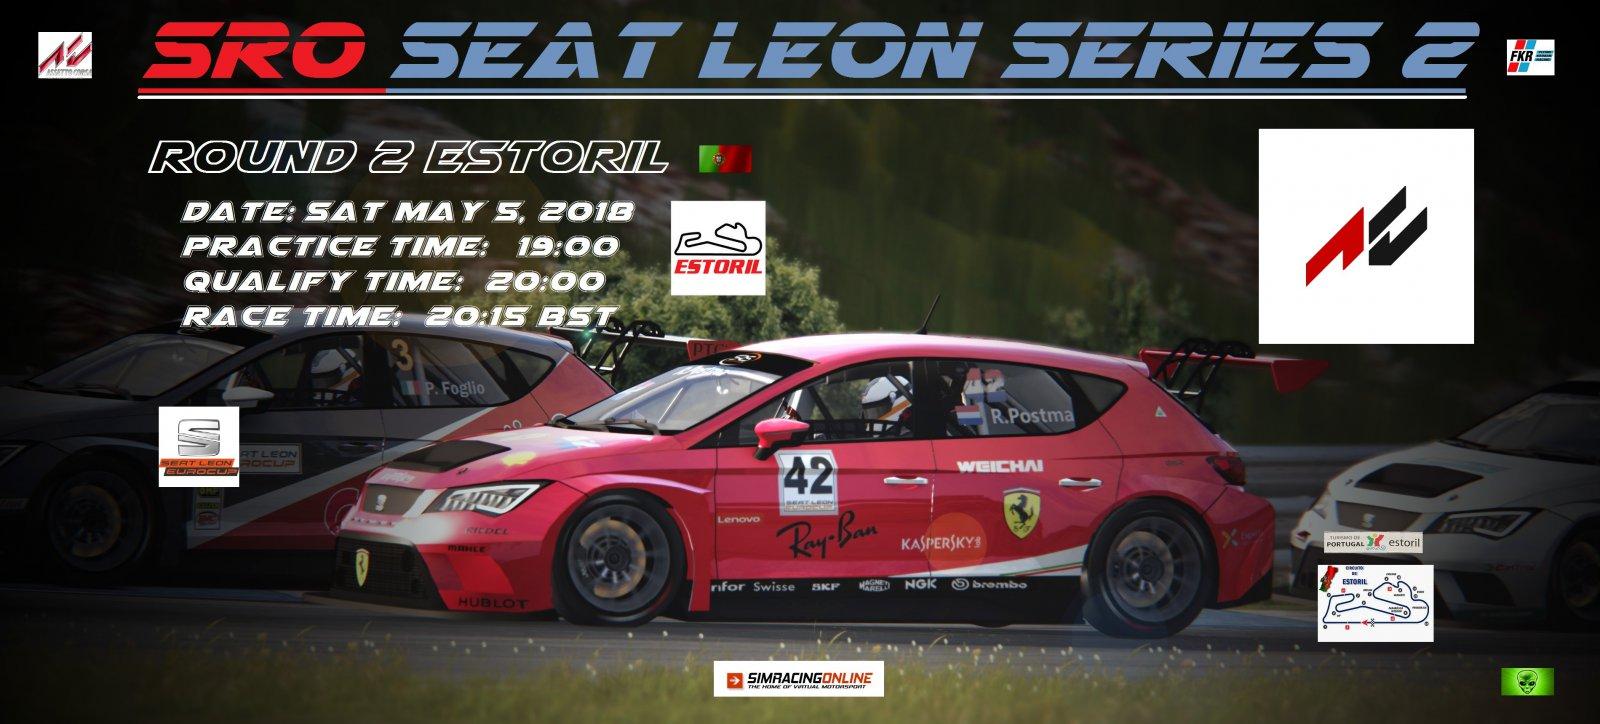 Screenshot_seat_leon_eurocup_estoril_22-4-118-16-21-31k2.jpg